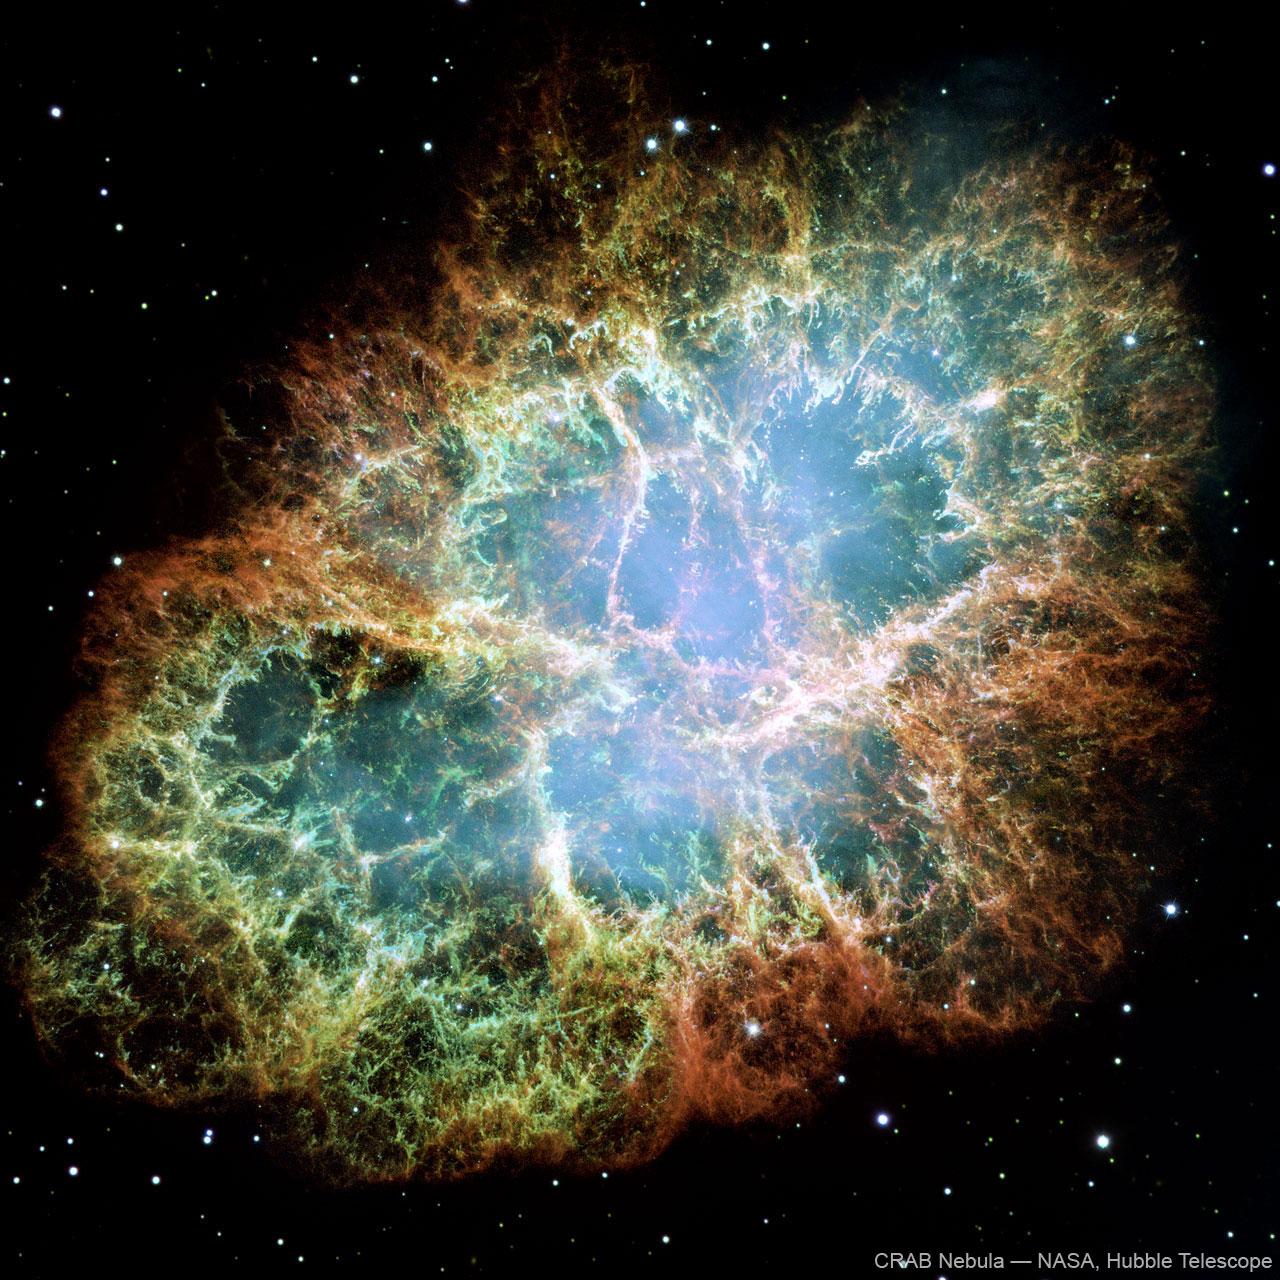 High resolution crab nebula space image loading